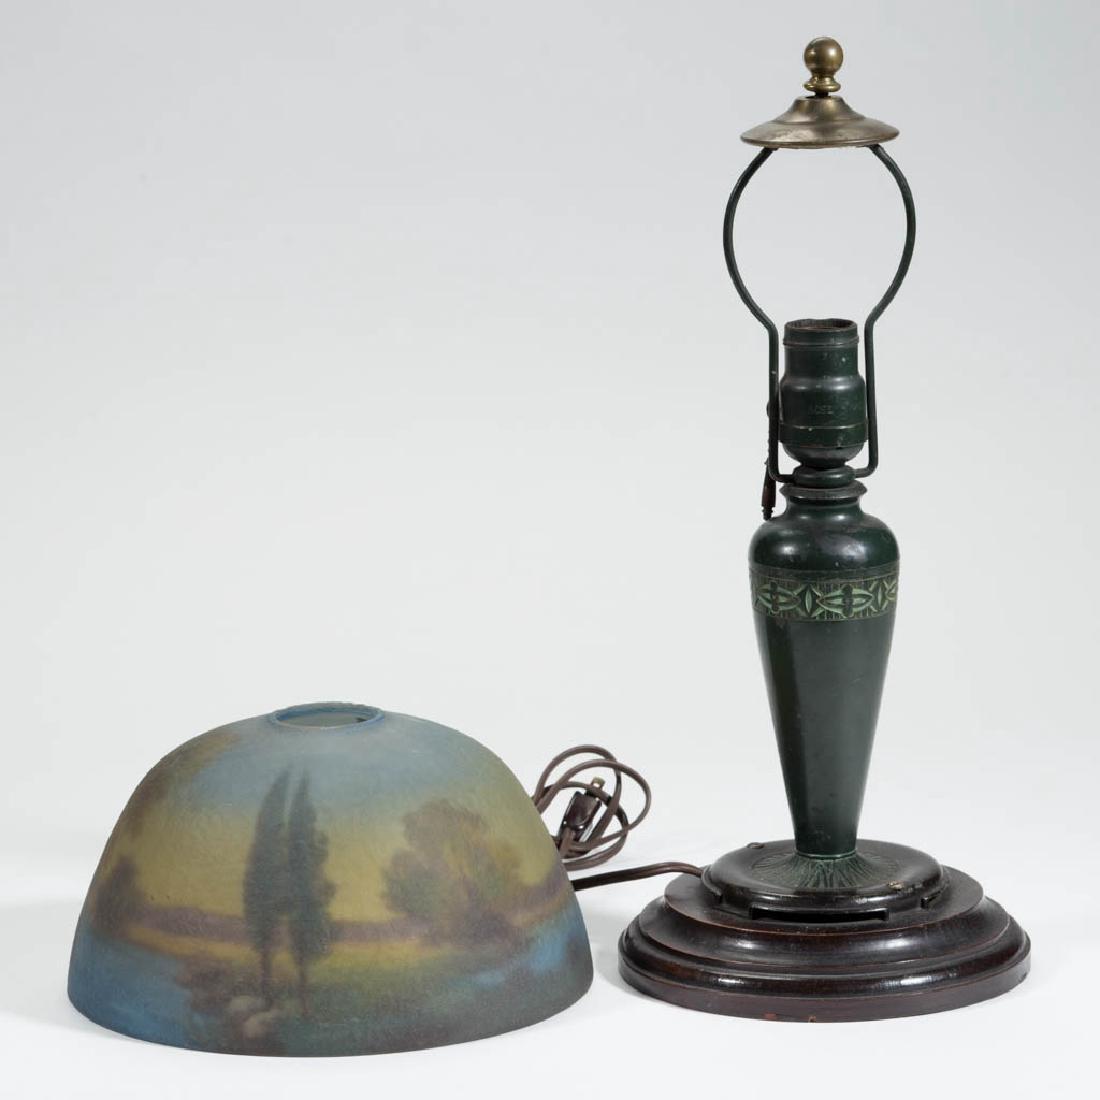 MOE BRIDGES REVERSE PAINTED ART GLASS TABLE LAMP - 2